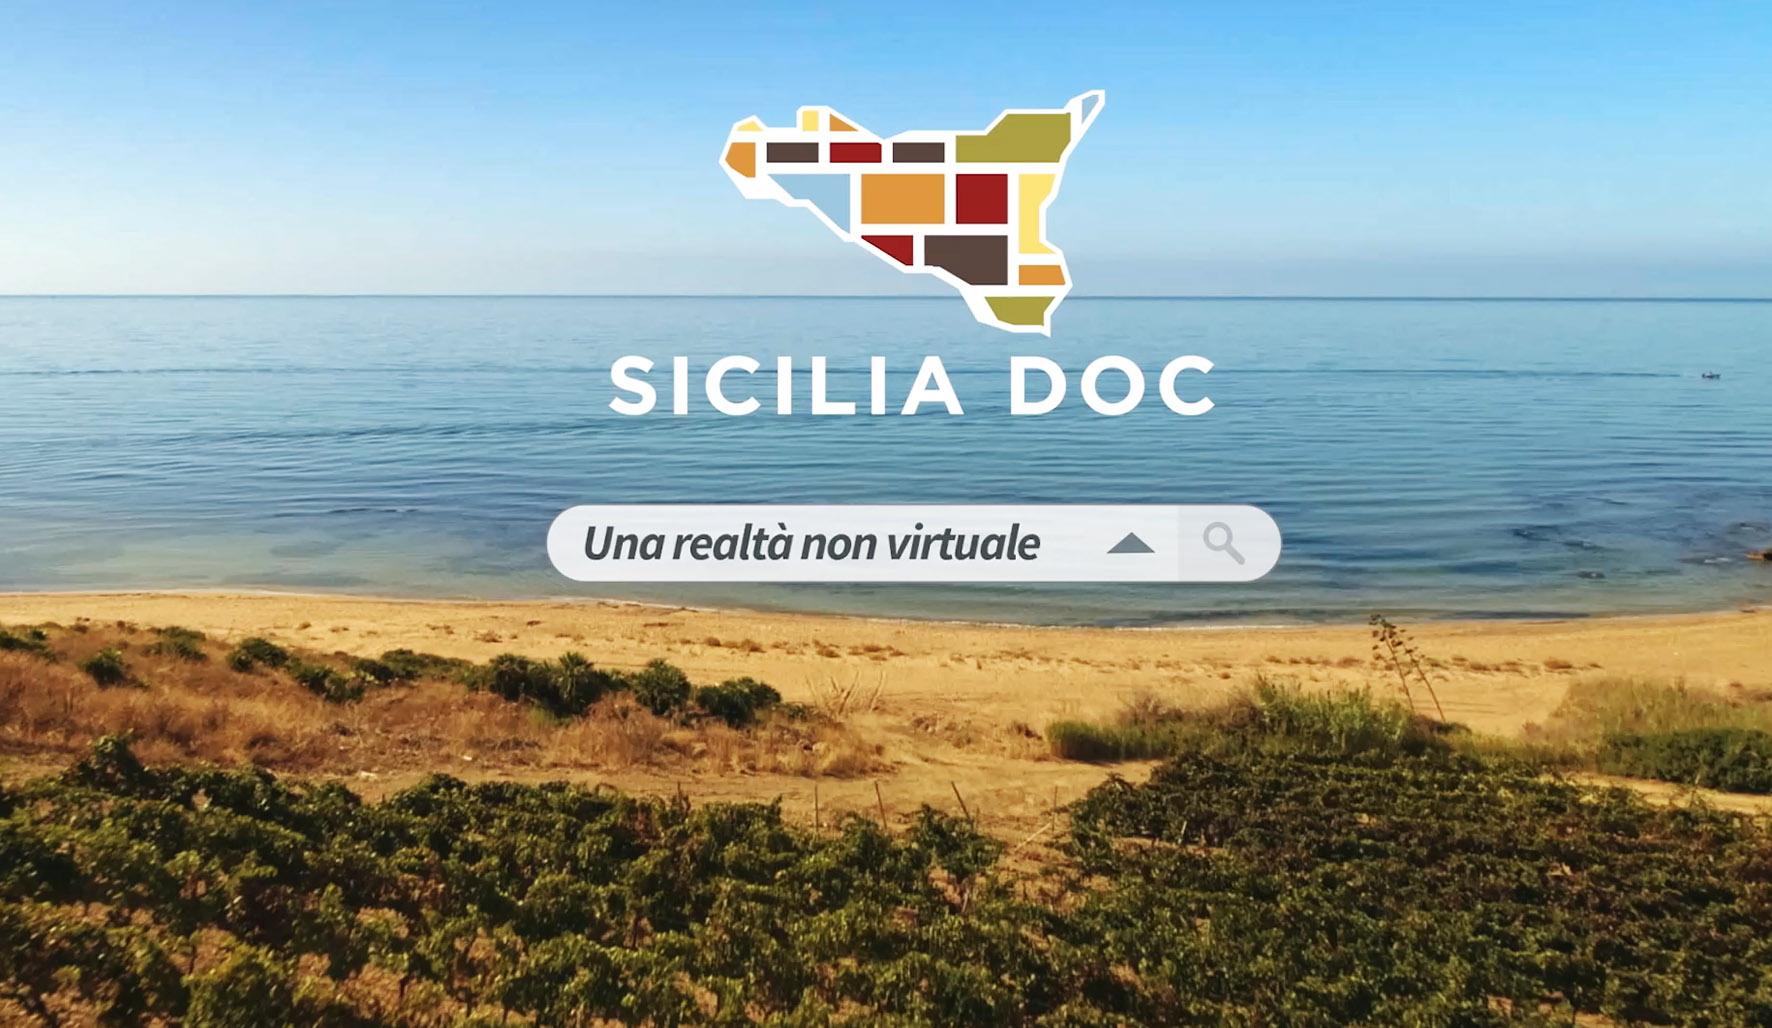 Vini Doc Sicilia frame 8 spot tv